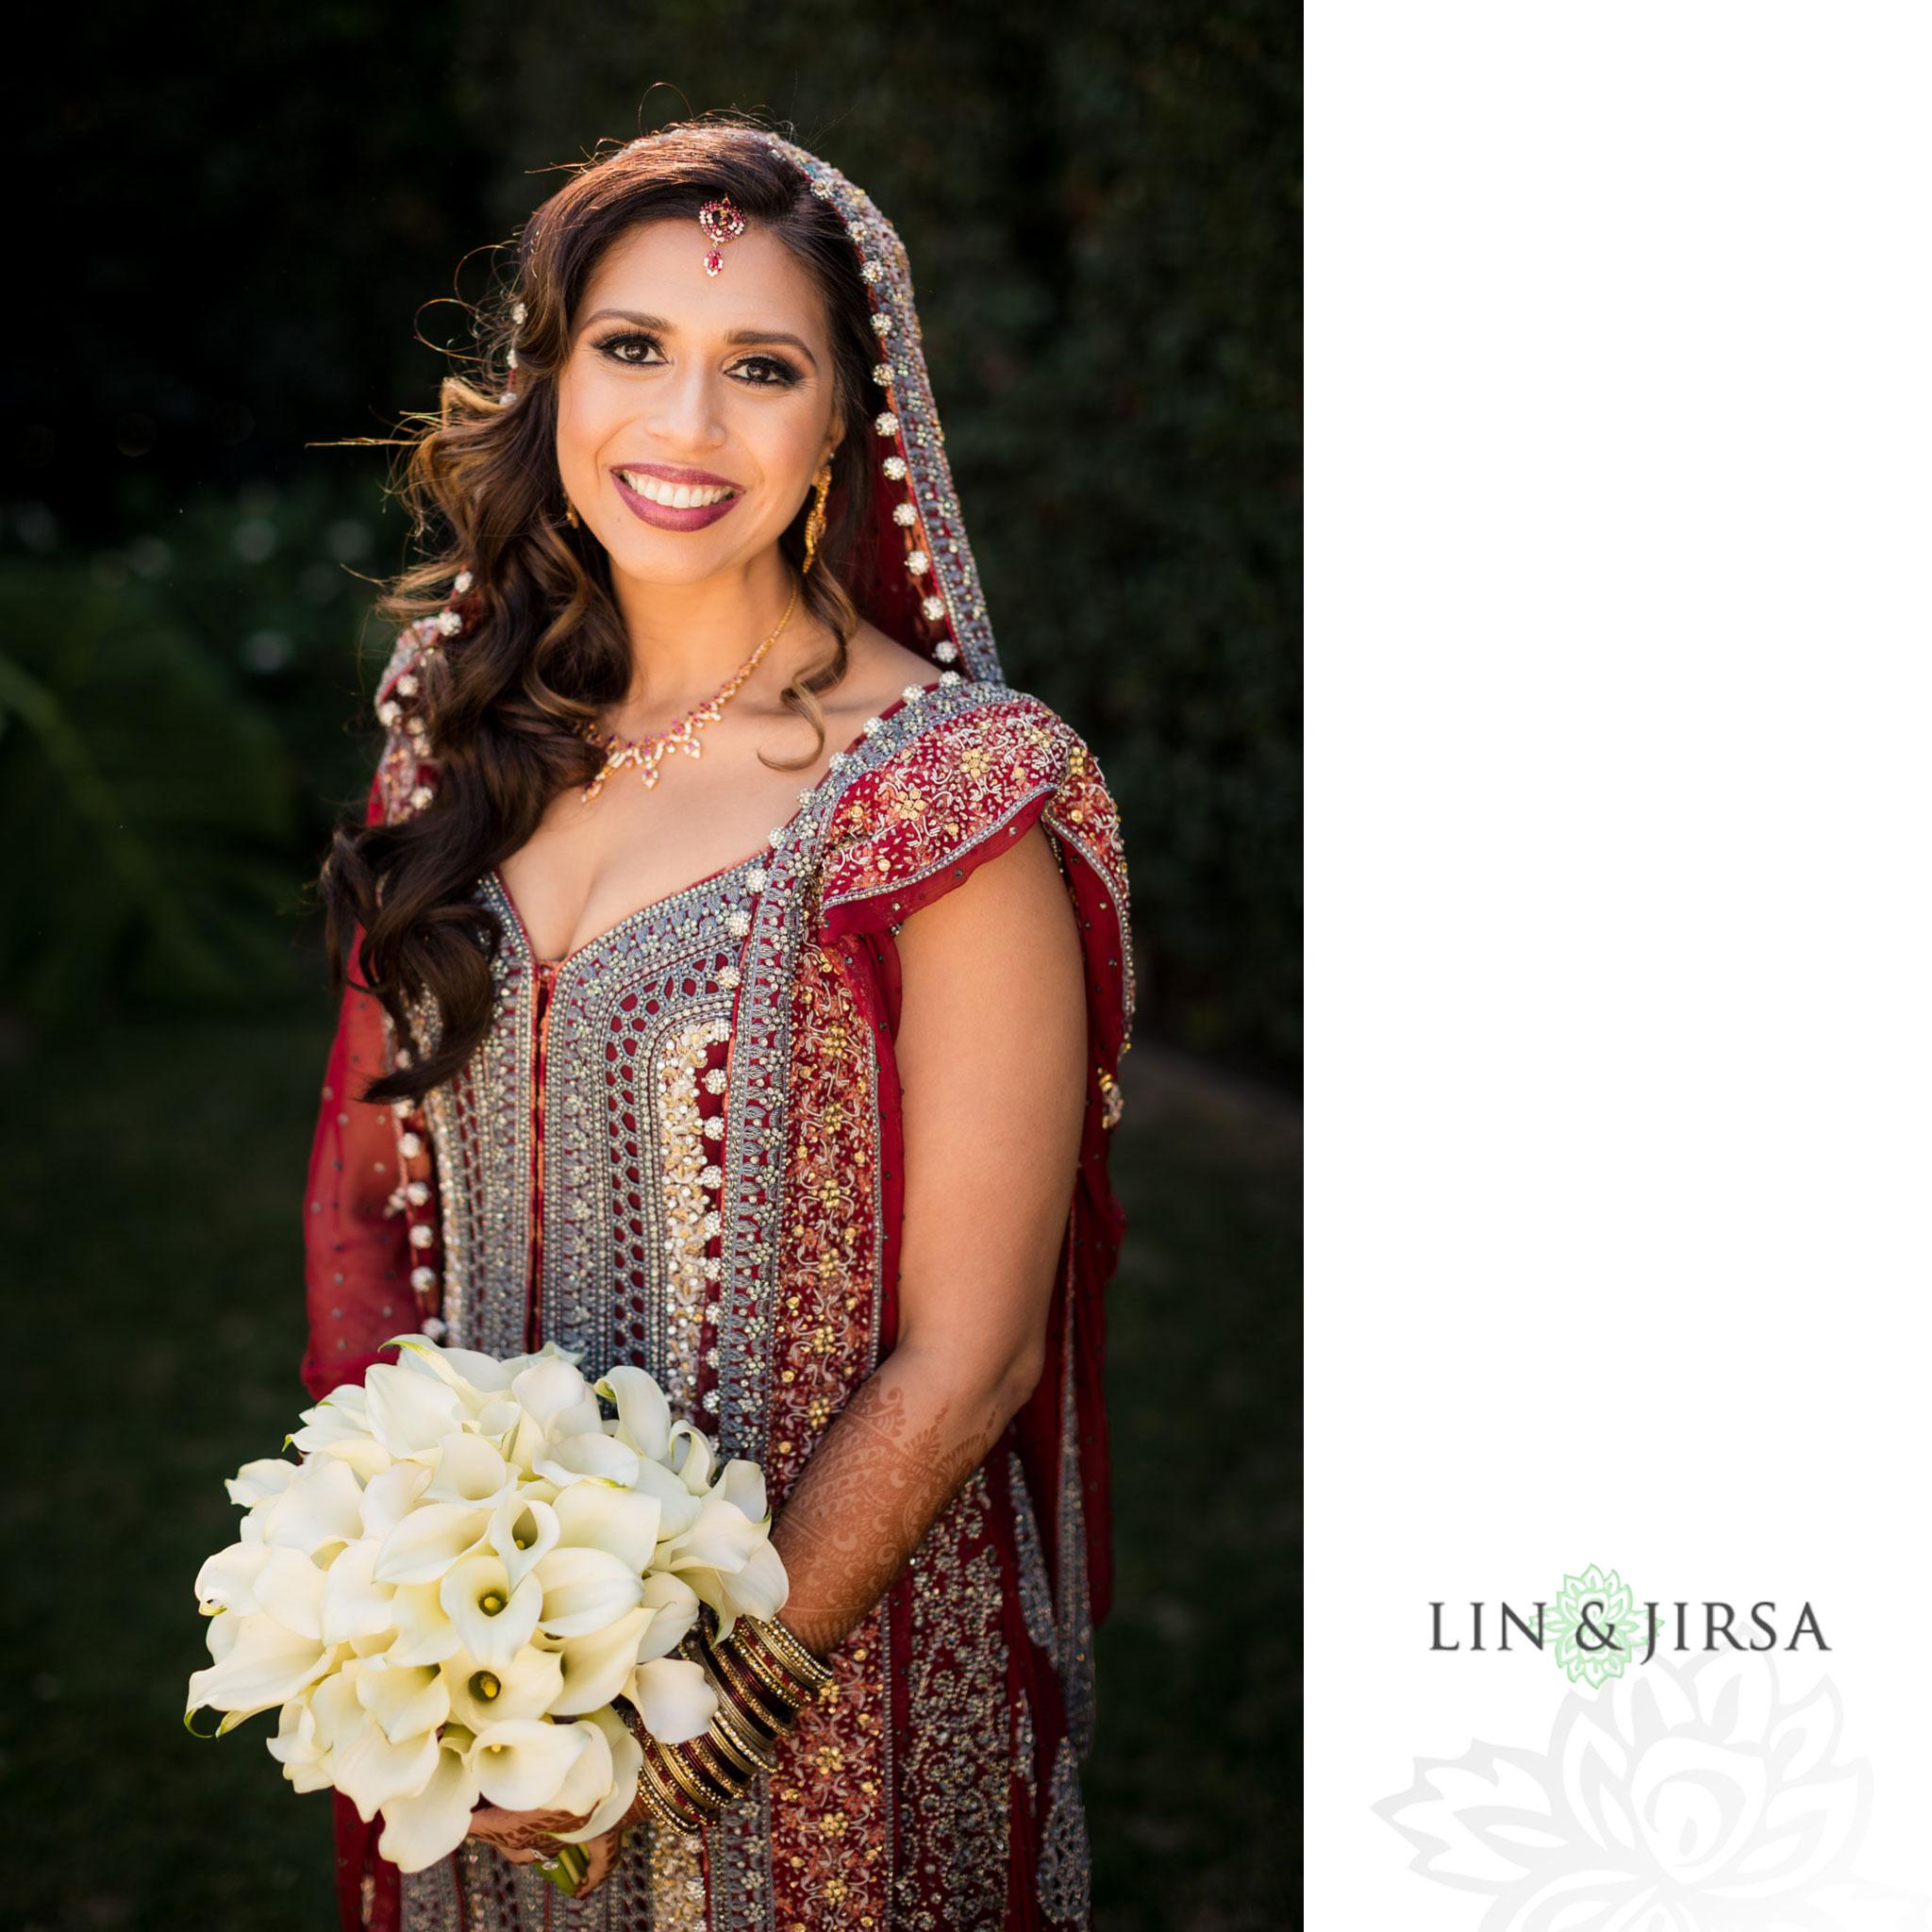 06 altadena town country club pakistani bride wedding photography